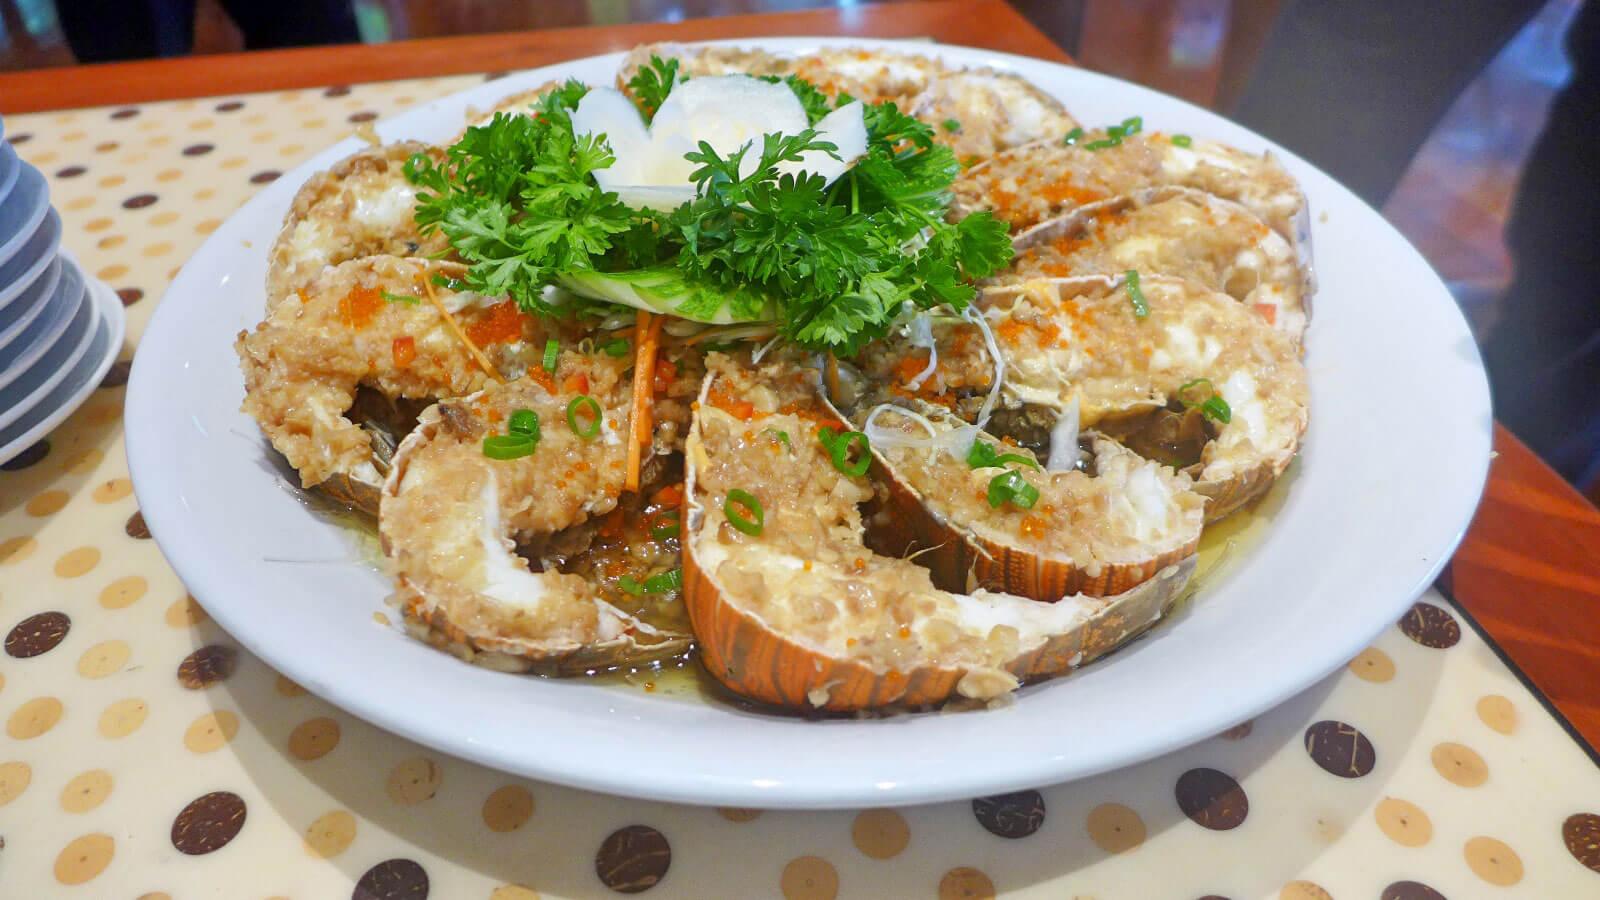 Baked lobster Cafe Marco Marco Polo Plaza Cebu